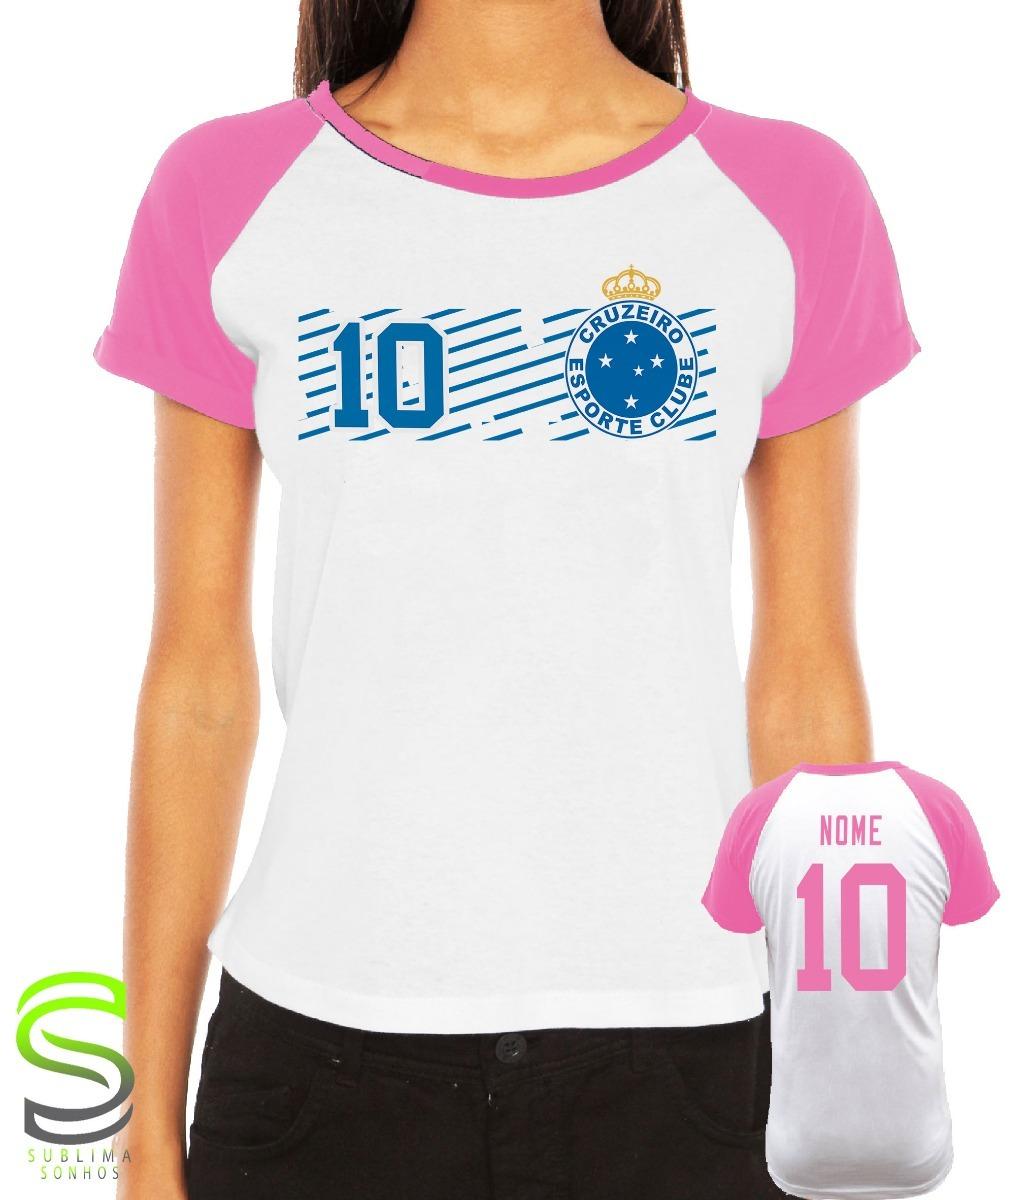 04626af005 camiseta cruzeiro feminina personalizada rosa. Carregando zoom.